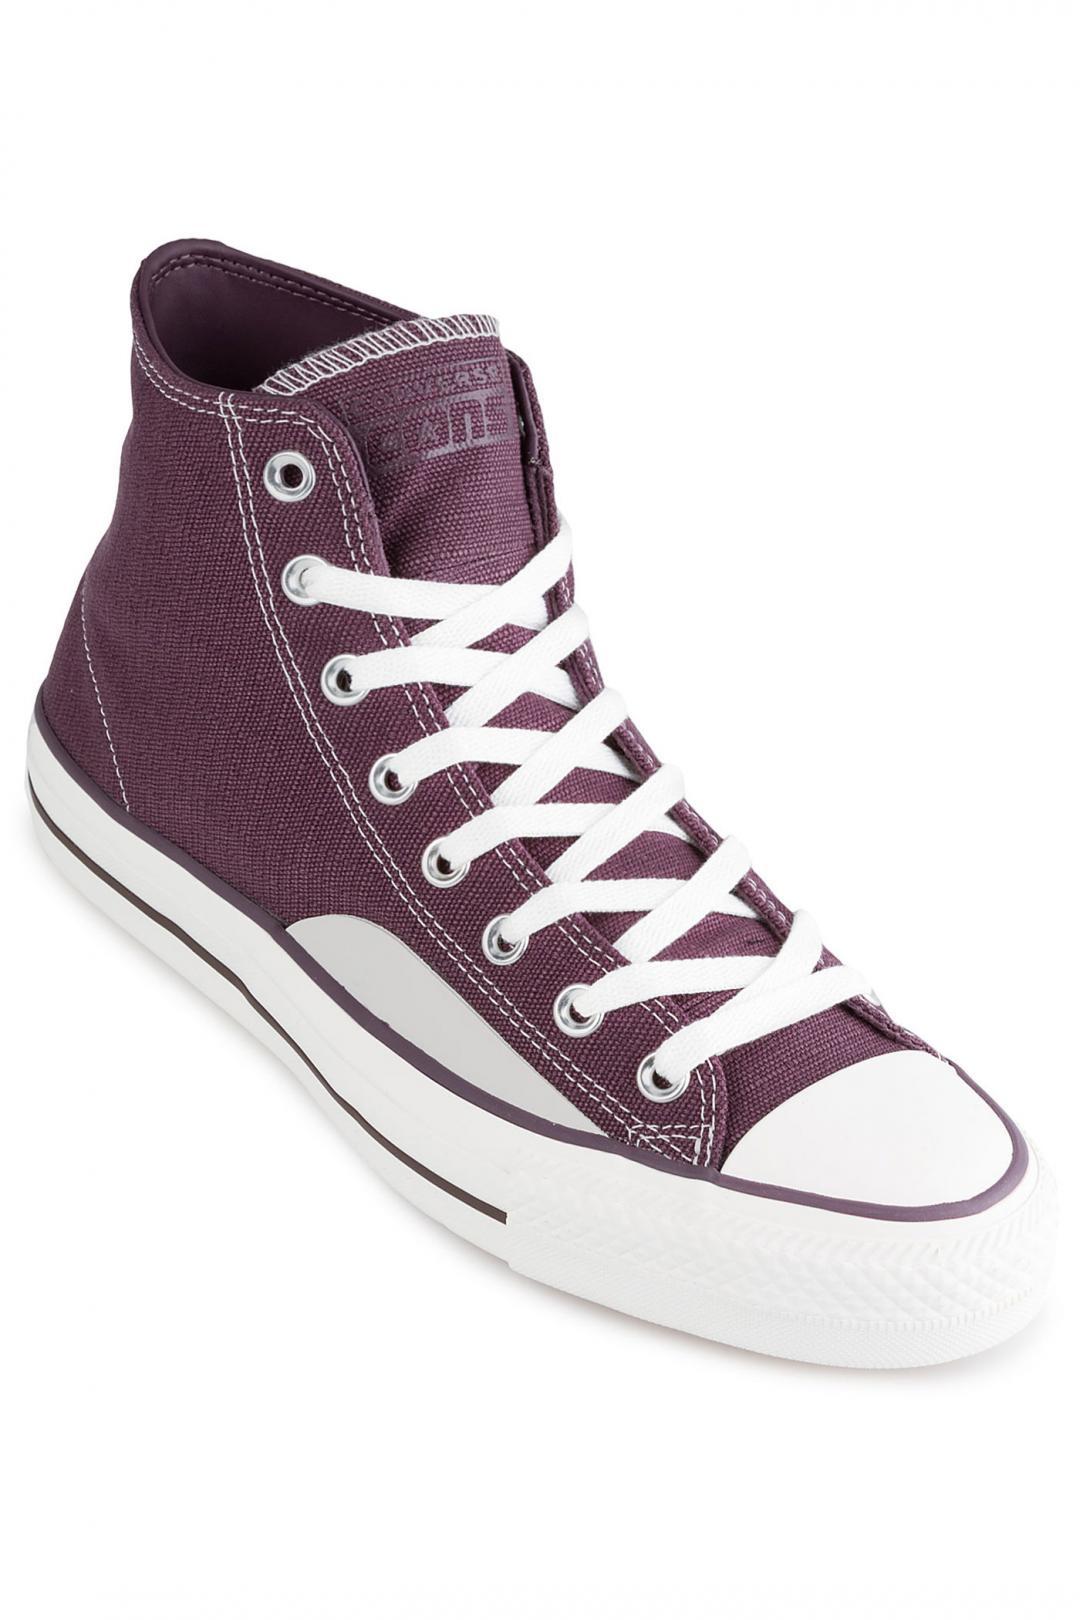 Uomo Converse Chuck Taylor All Star Pro Hi dusk purple vintage white gum   Scarpe da skate